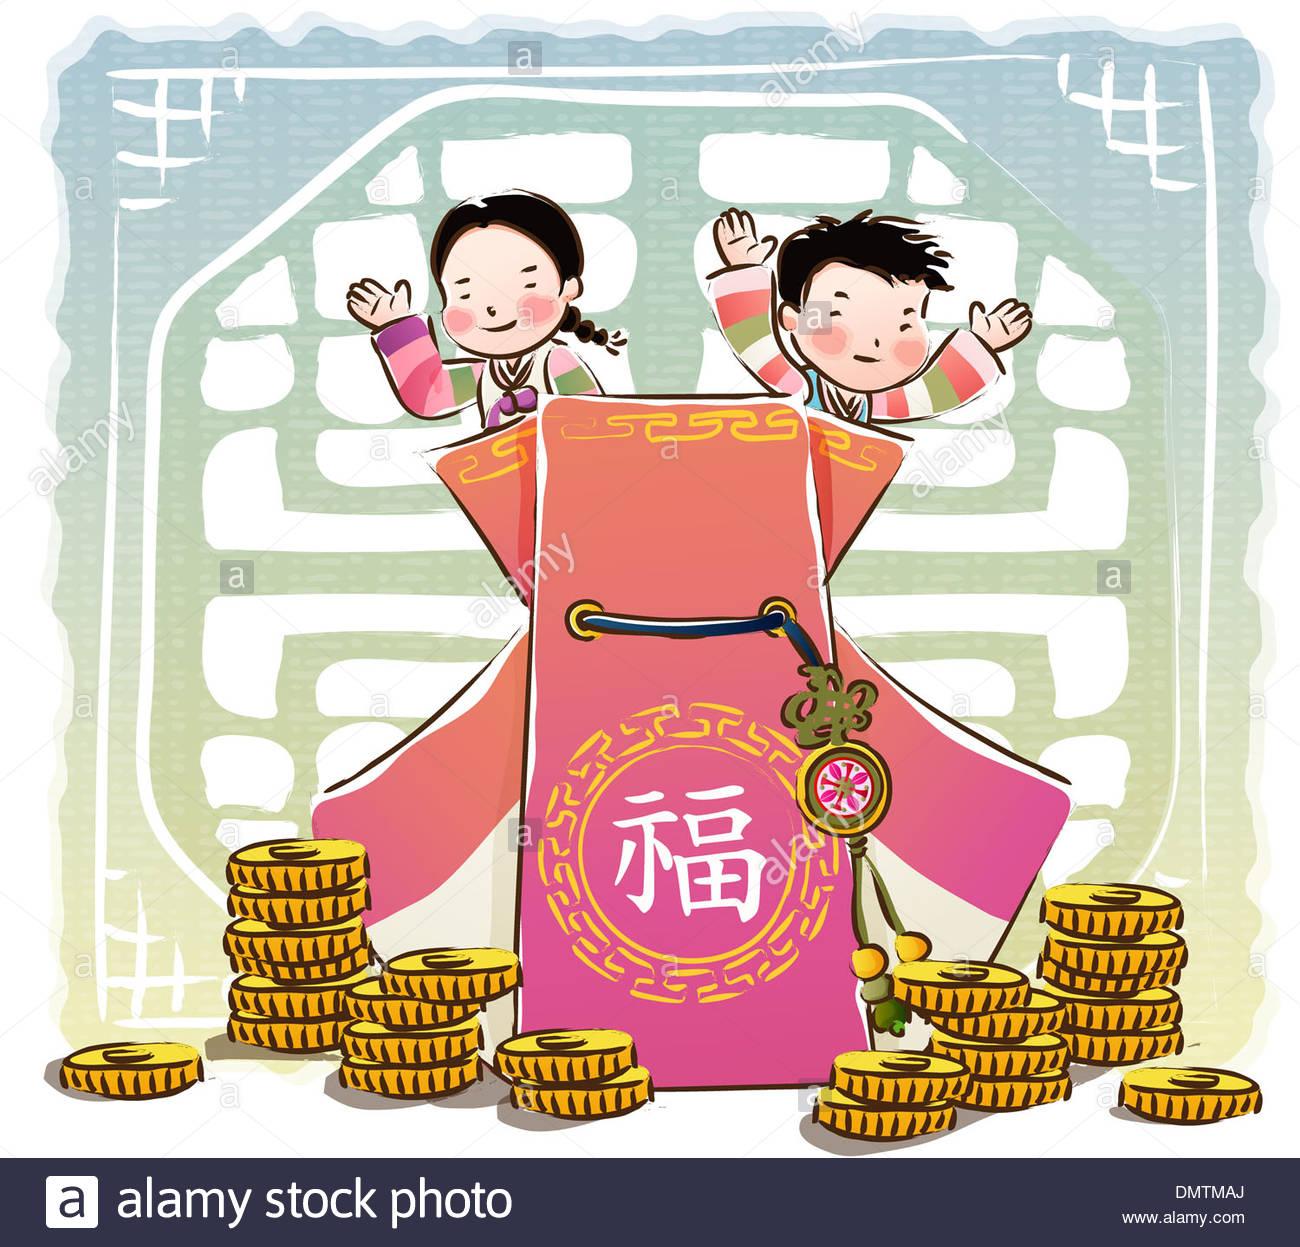 Greetings new year korean dress girl boy couple stock photo greetings new year korean dress girl boy couple m4hsunfo Images